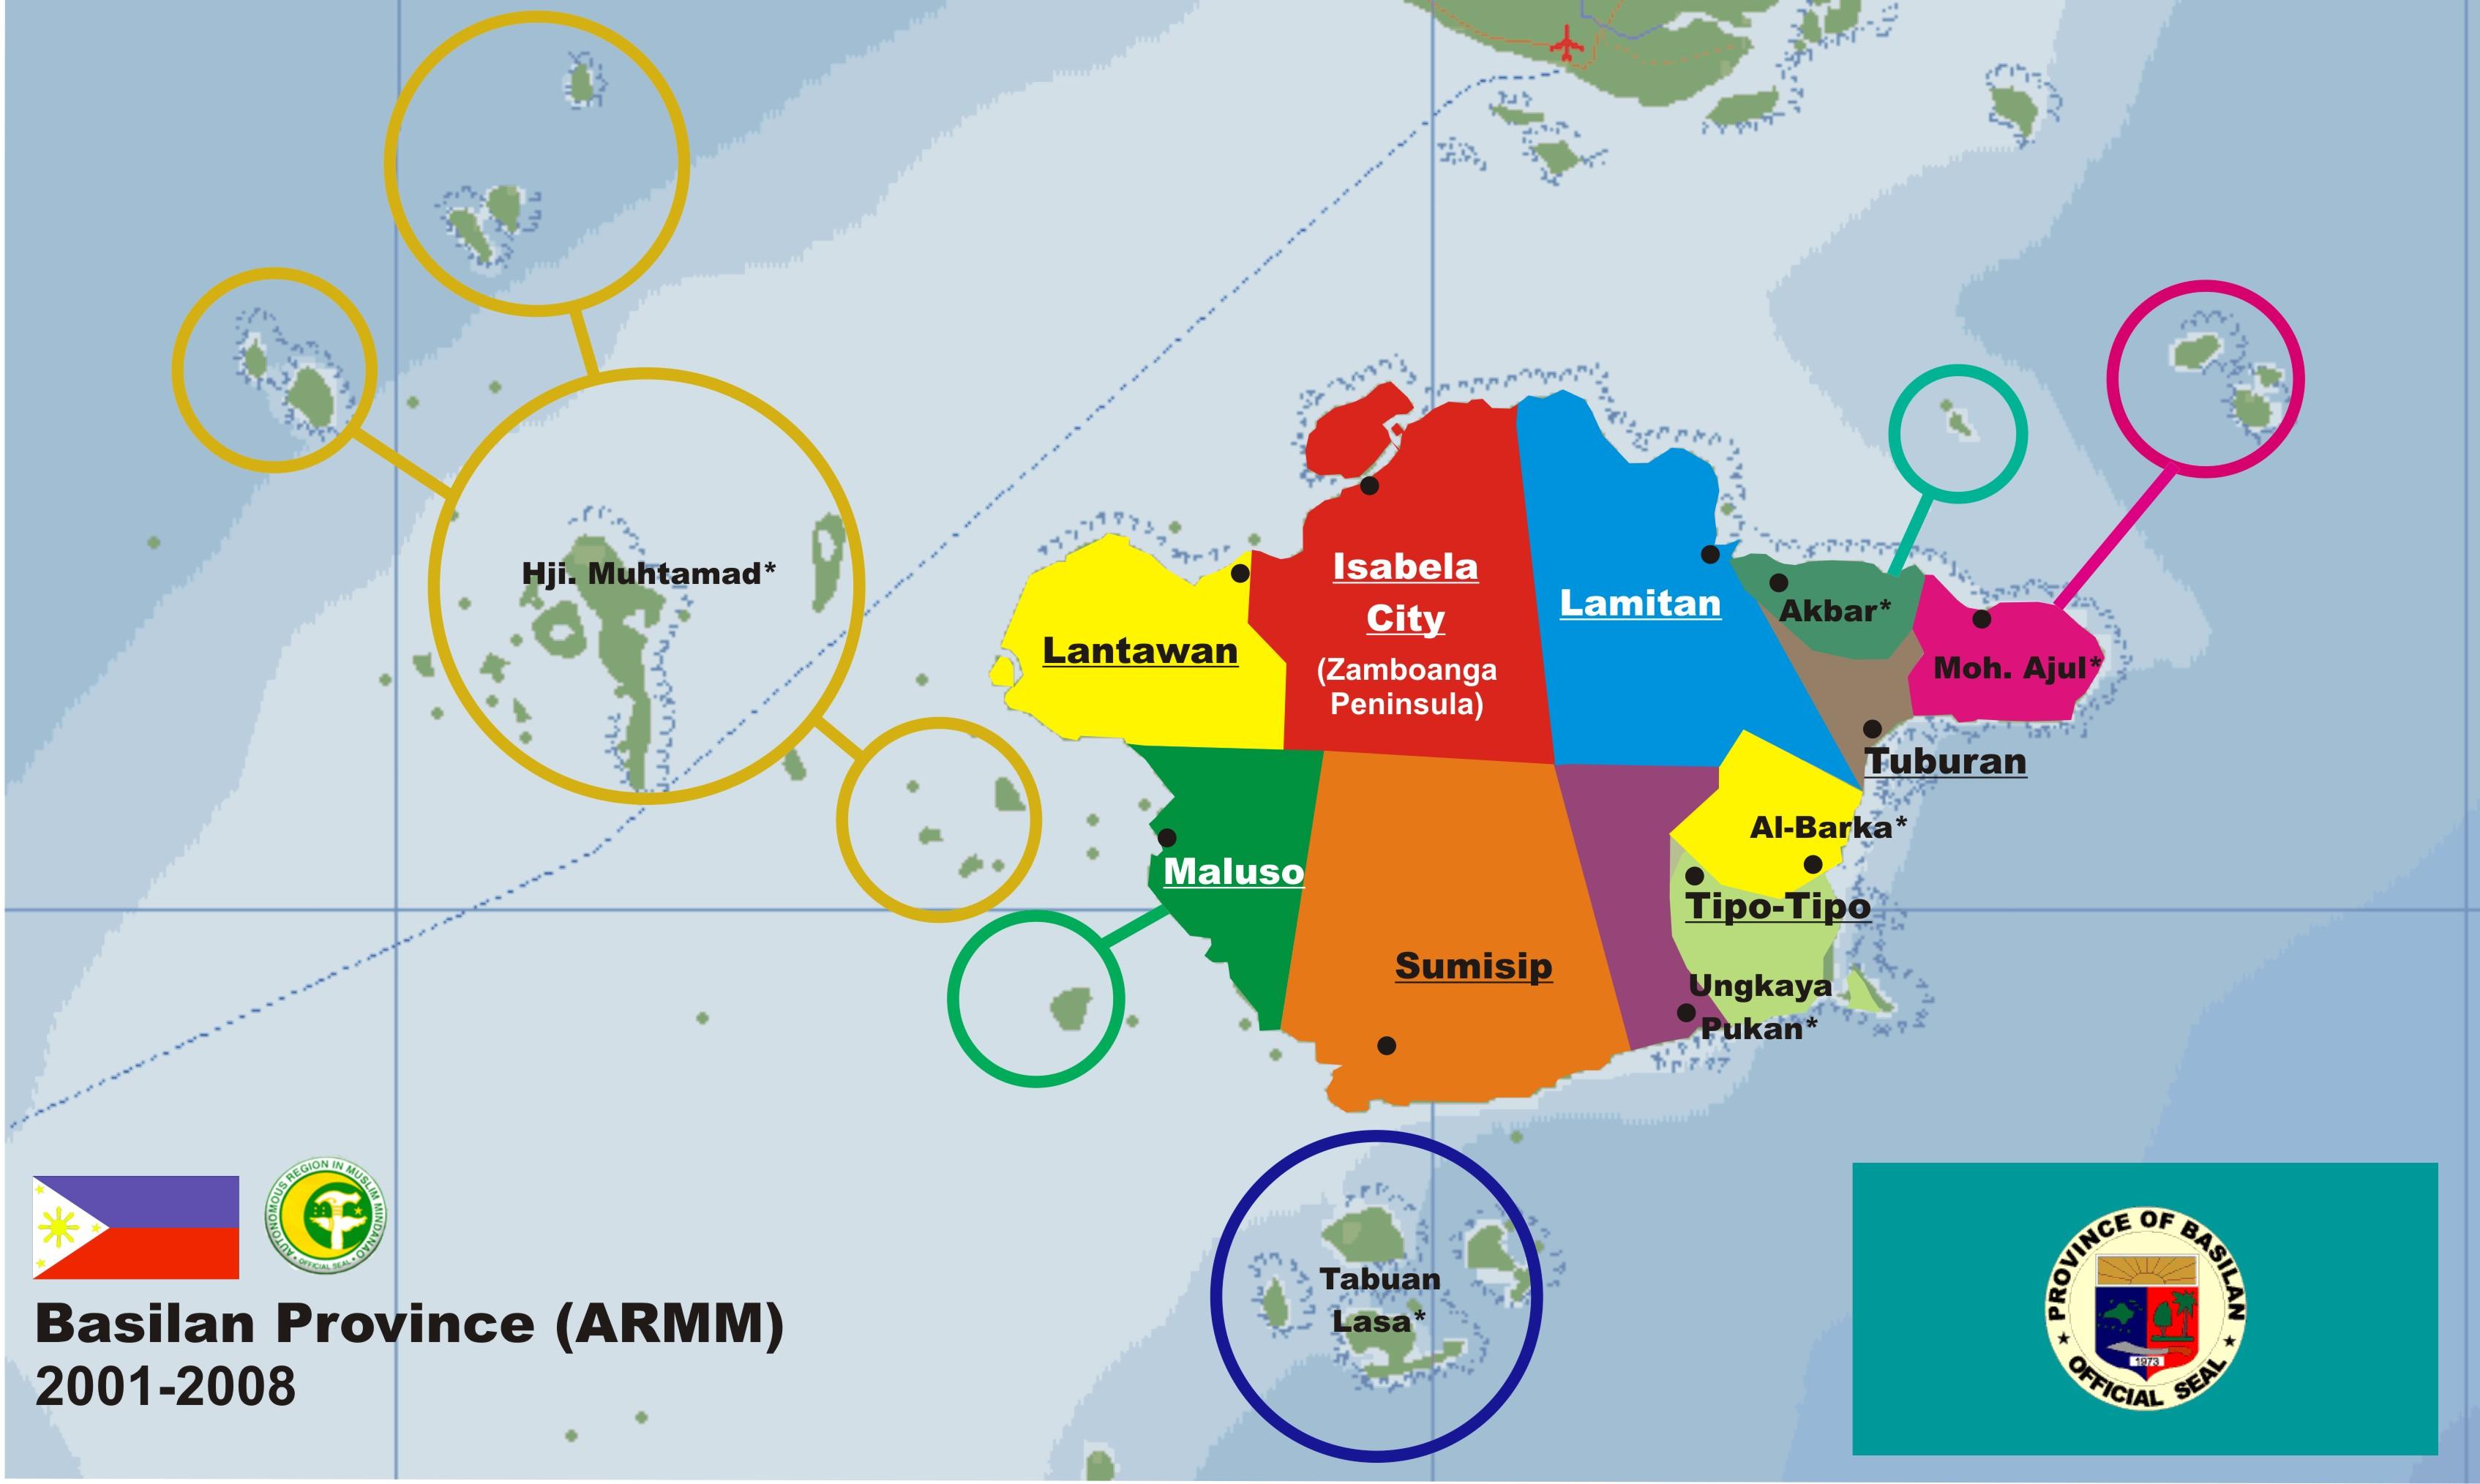 File:Basilan Political Map   2009 A.D.  , Basilan in Mindanao